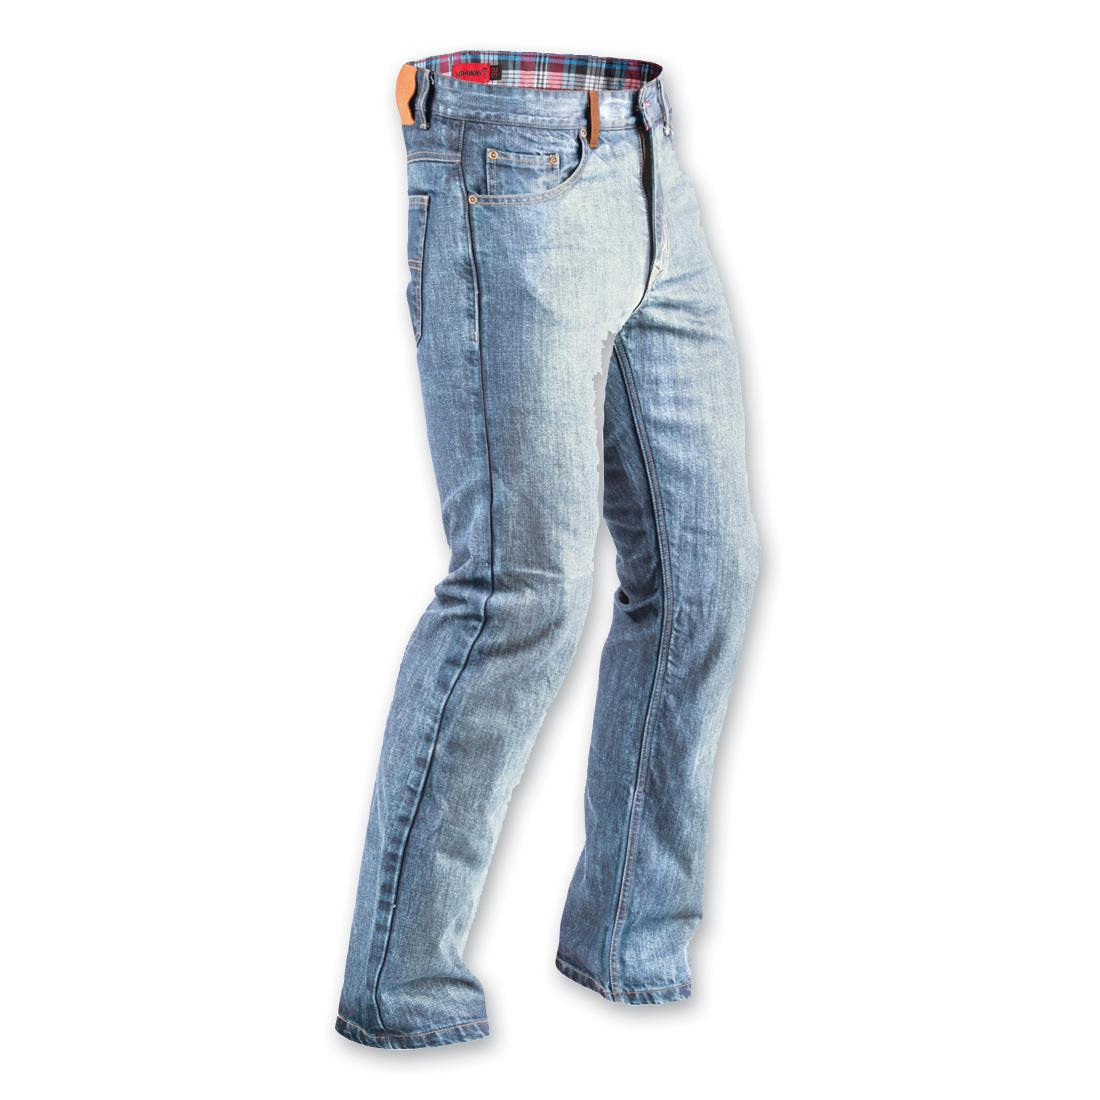 Highway 21 Men's Defender Indigo Jeans